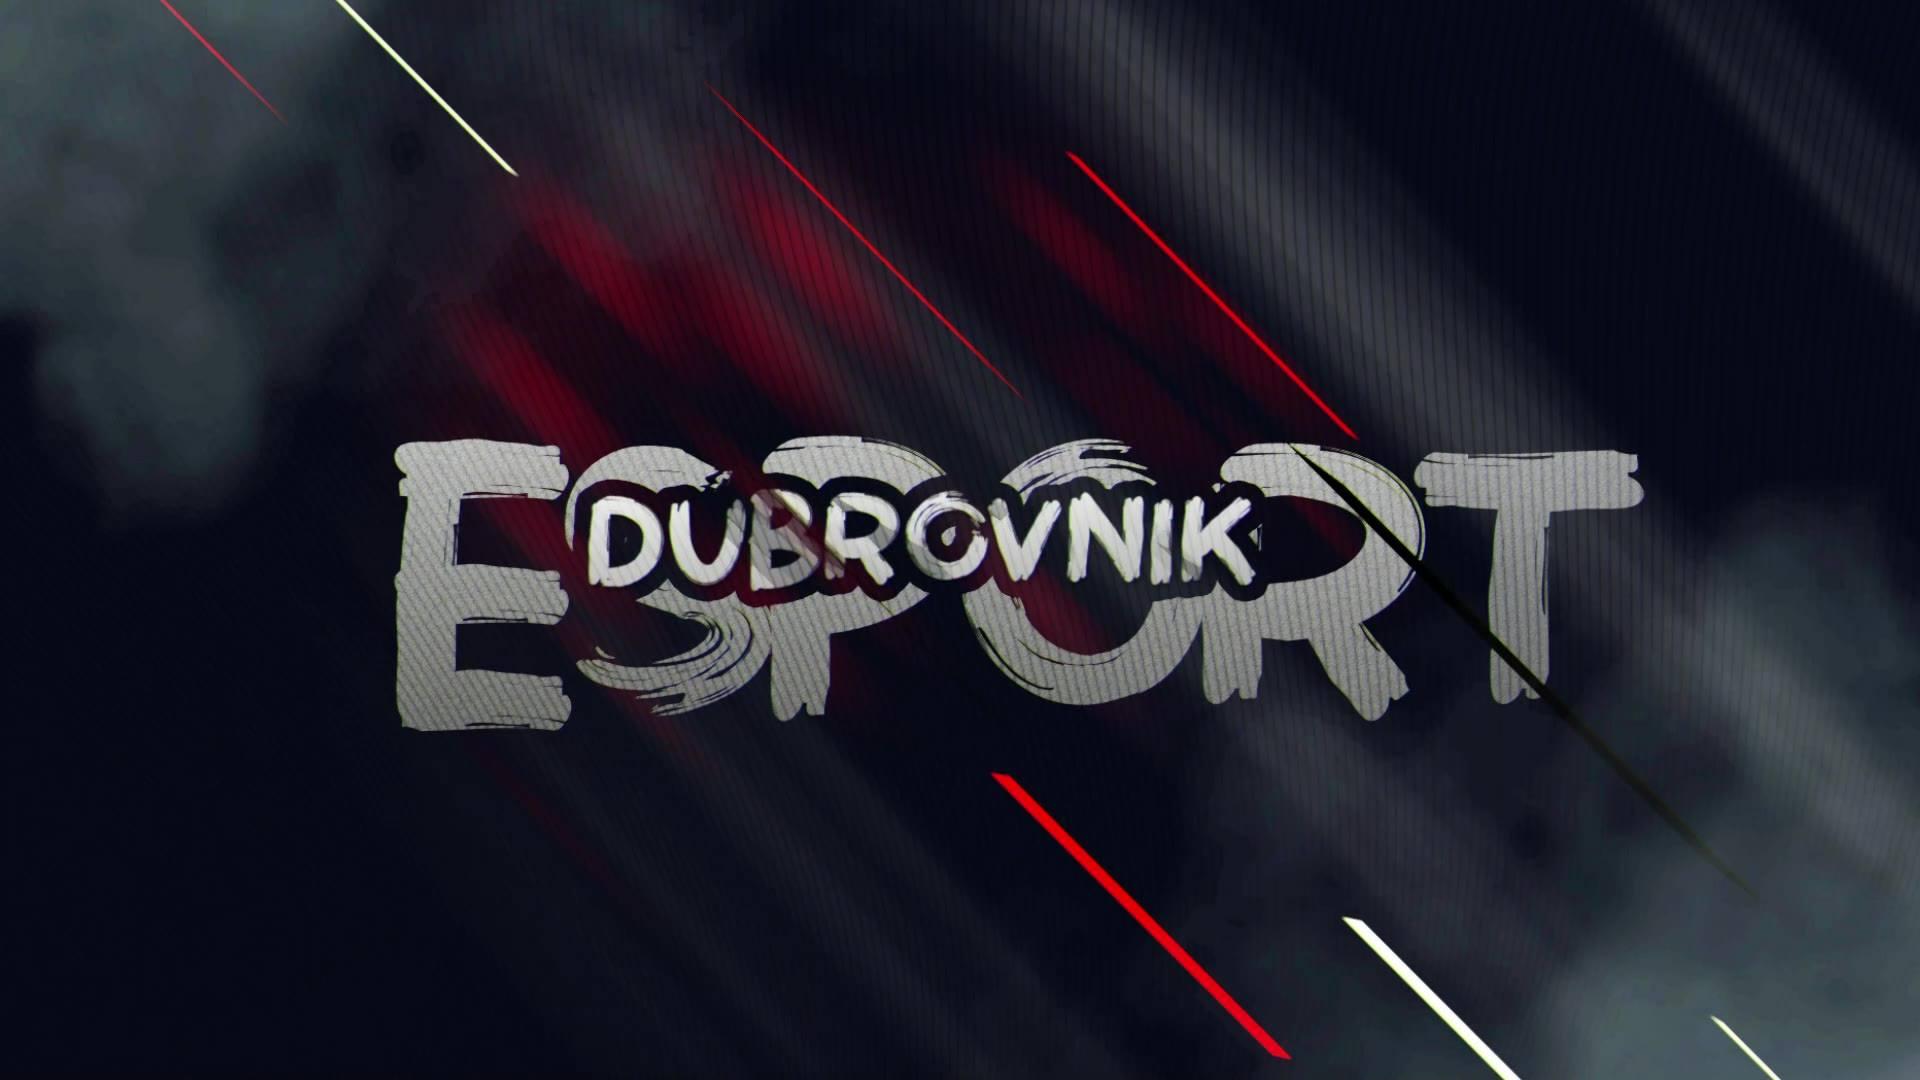 Dubrovnik eSport